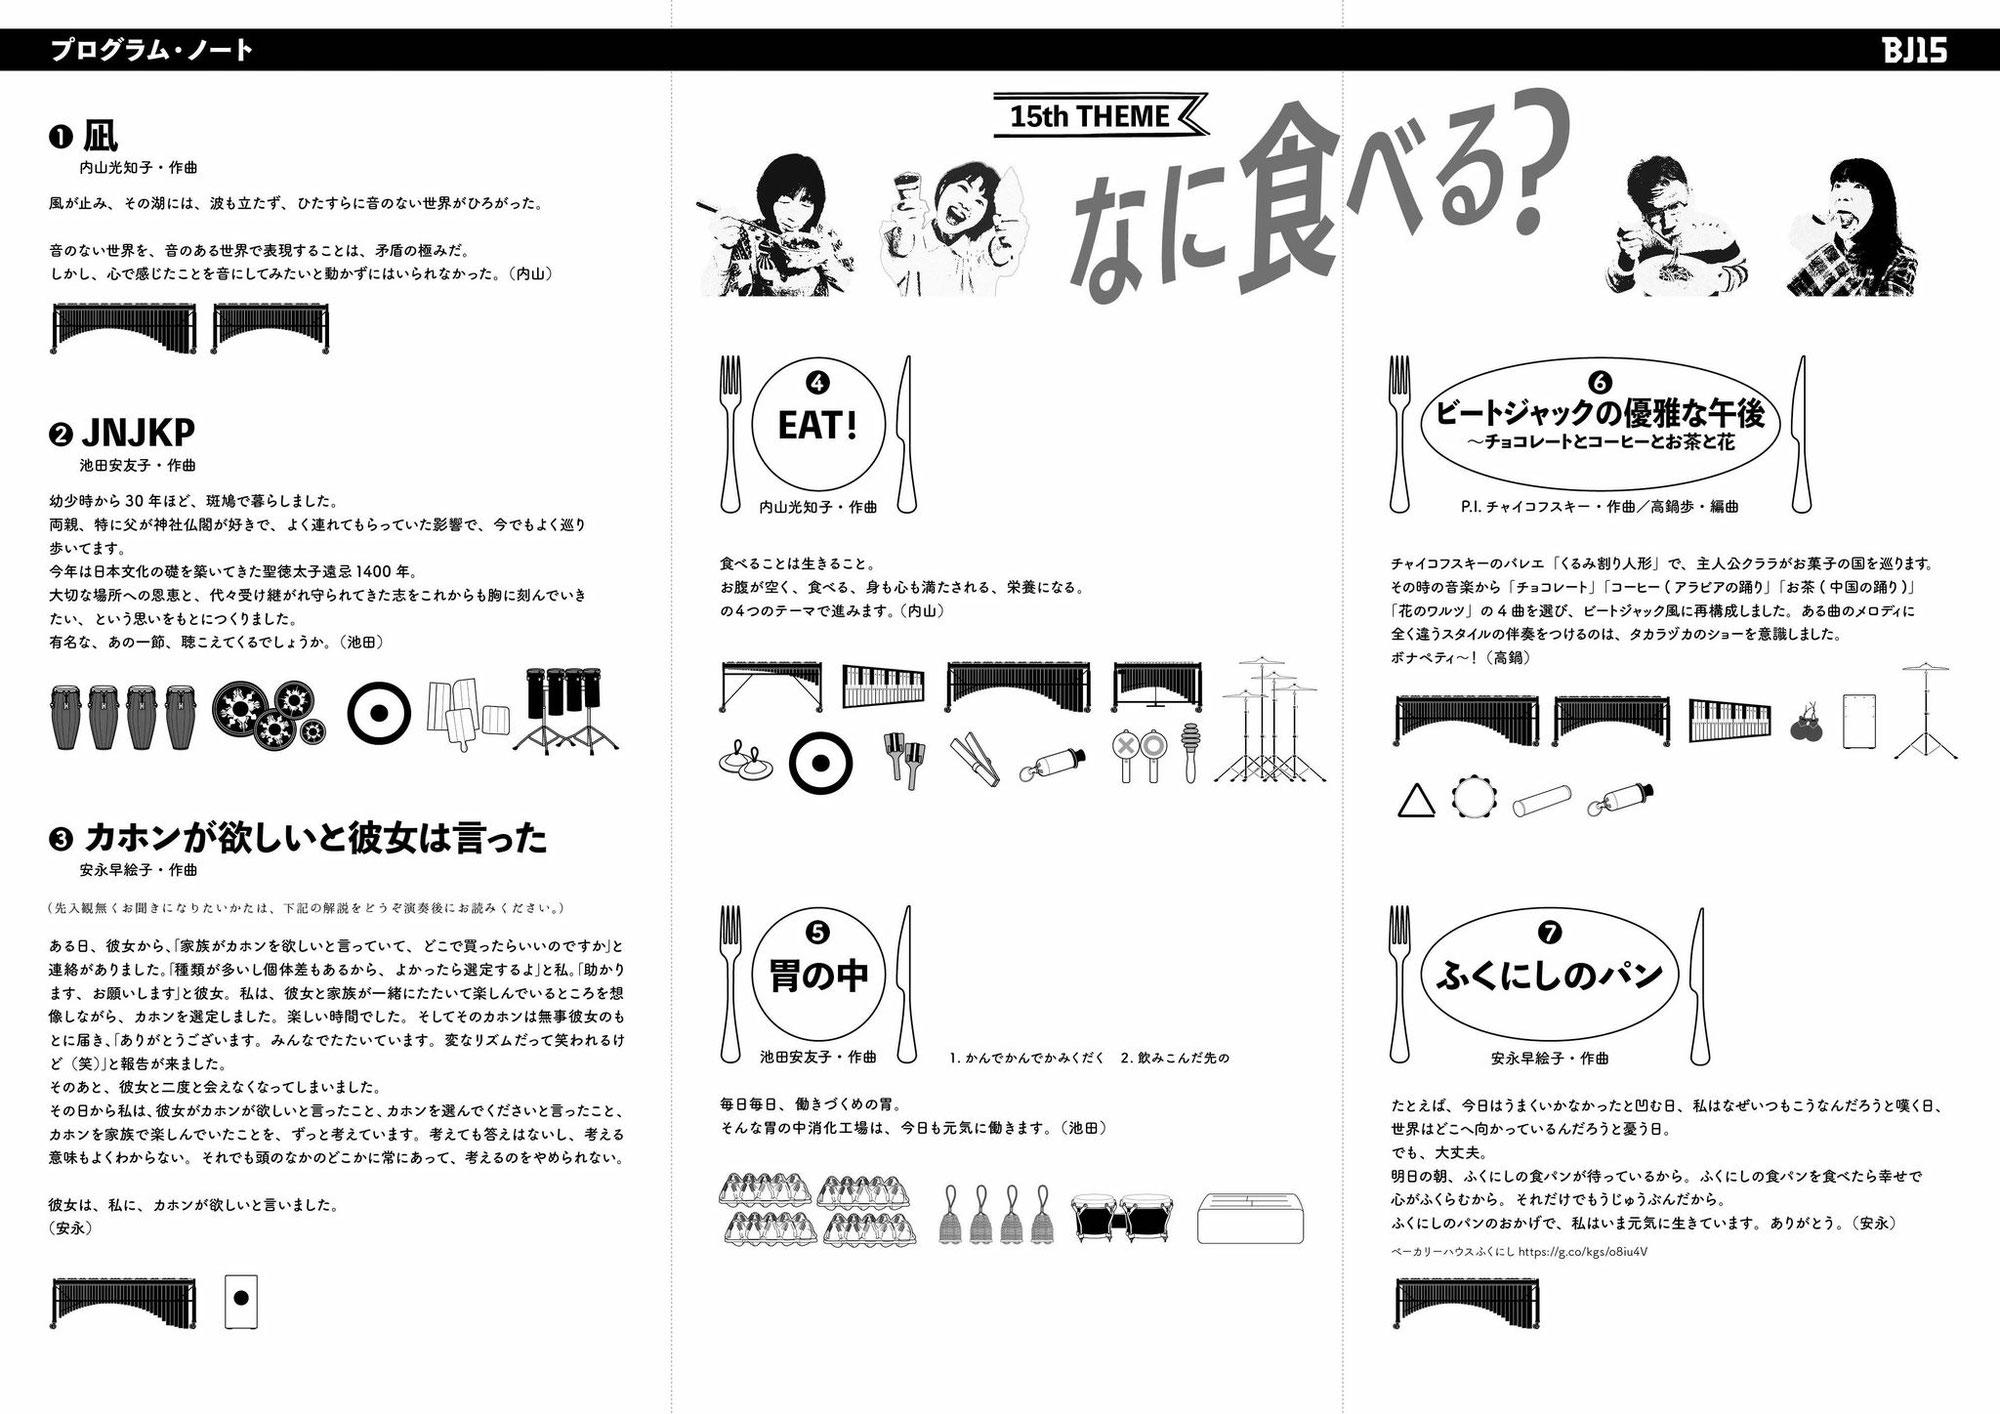 BJ15th 印刷物紹介